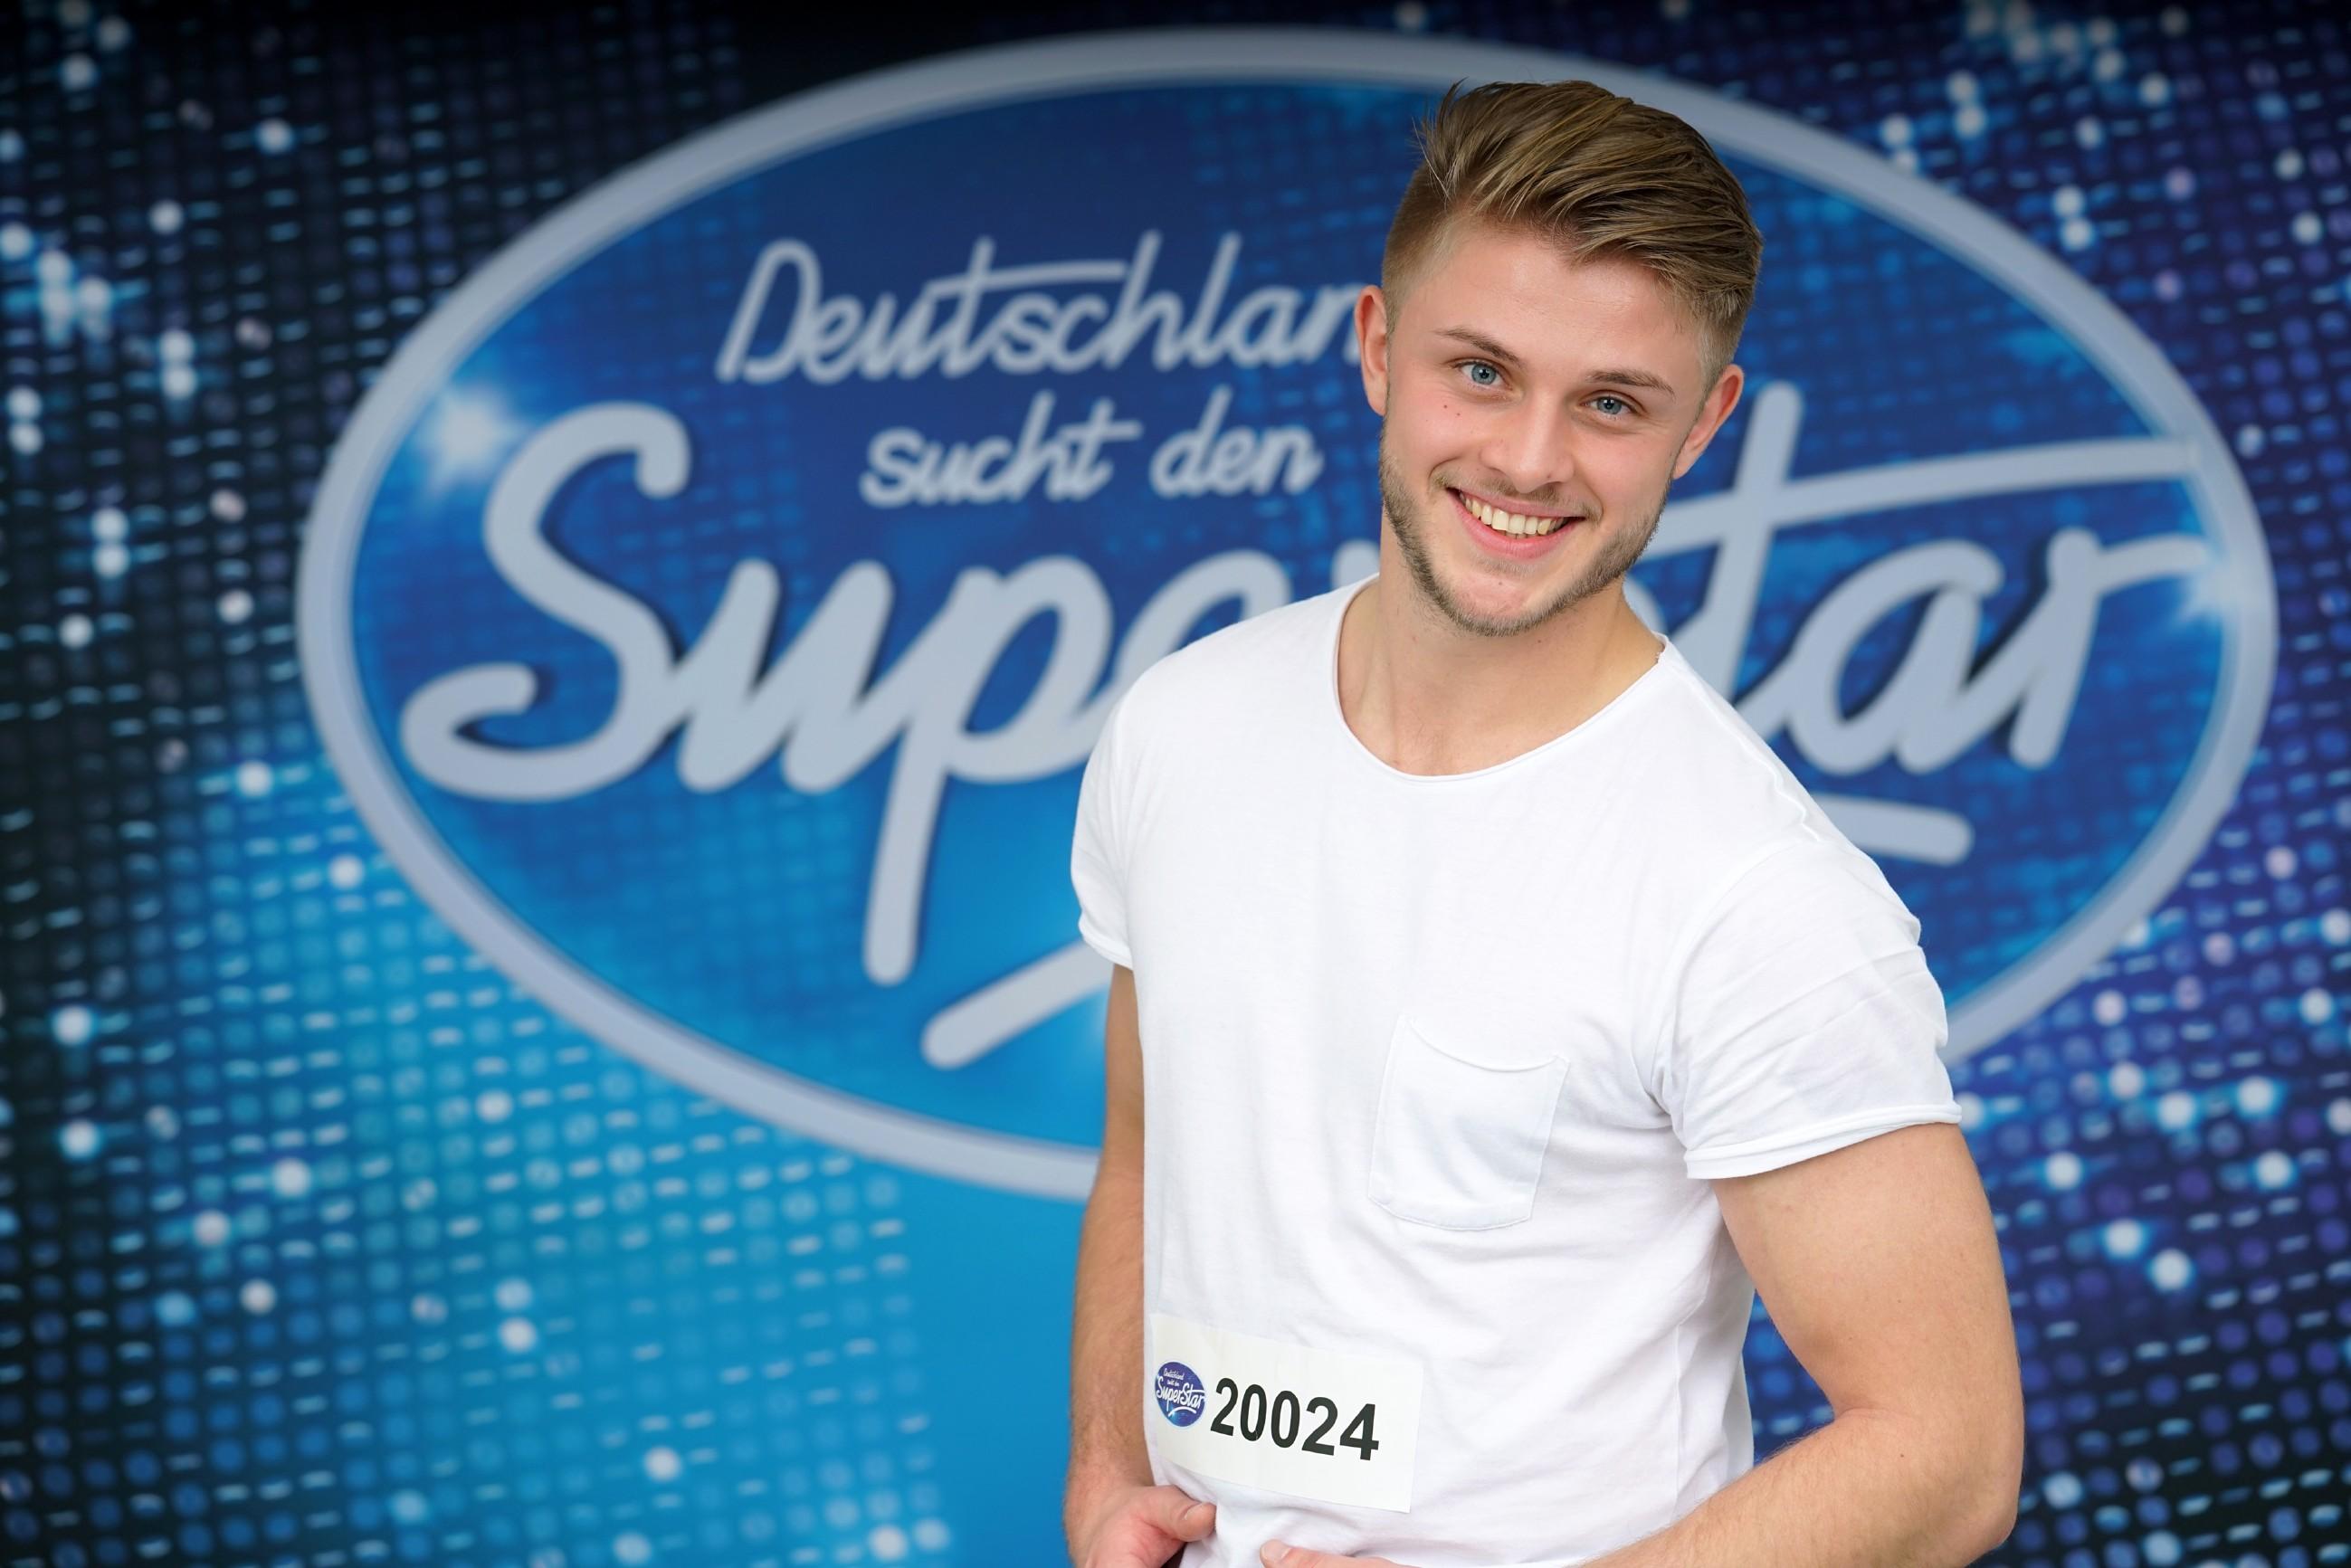 DSDS 2018 TOP 24 - Sven Lüchtenborg